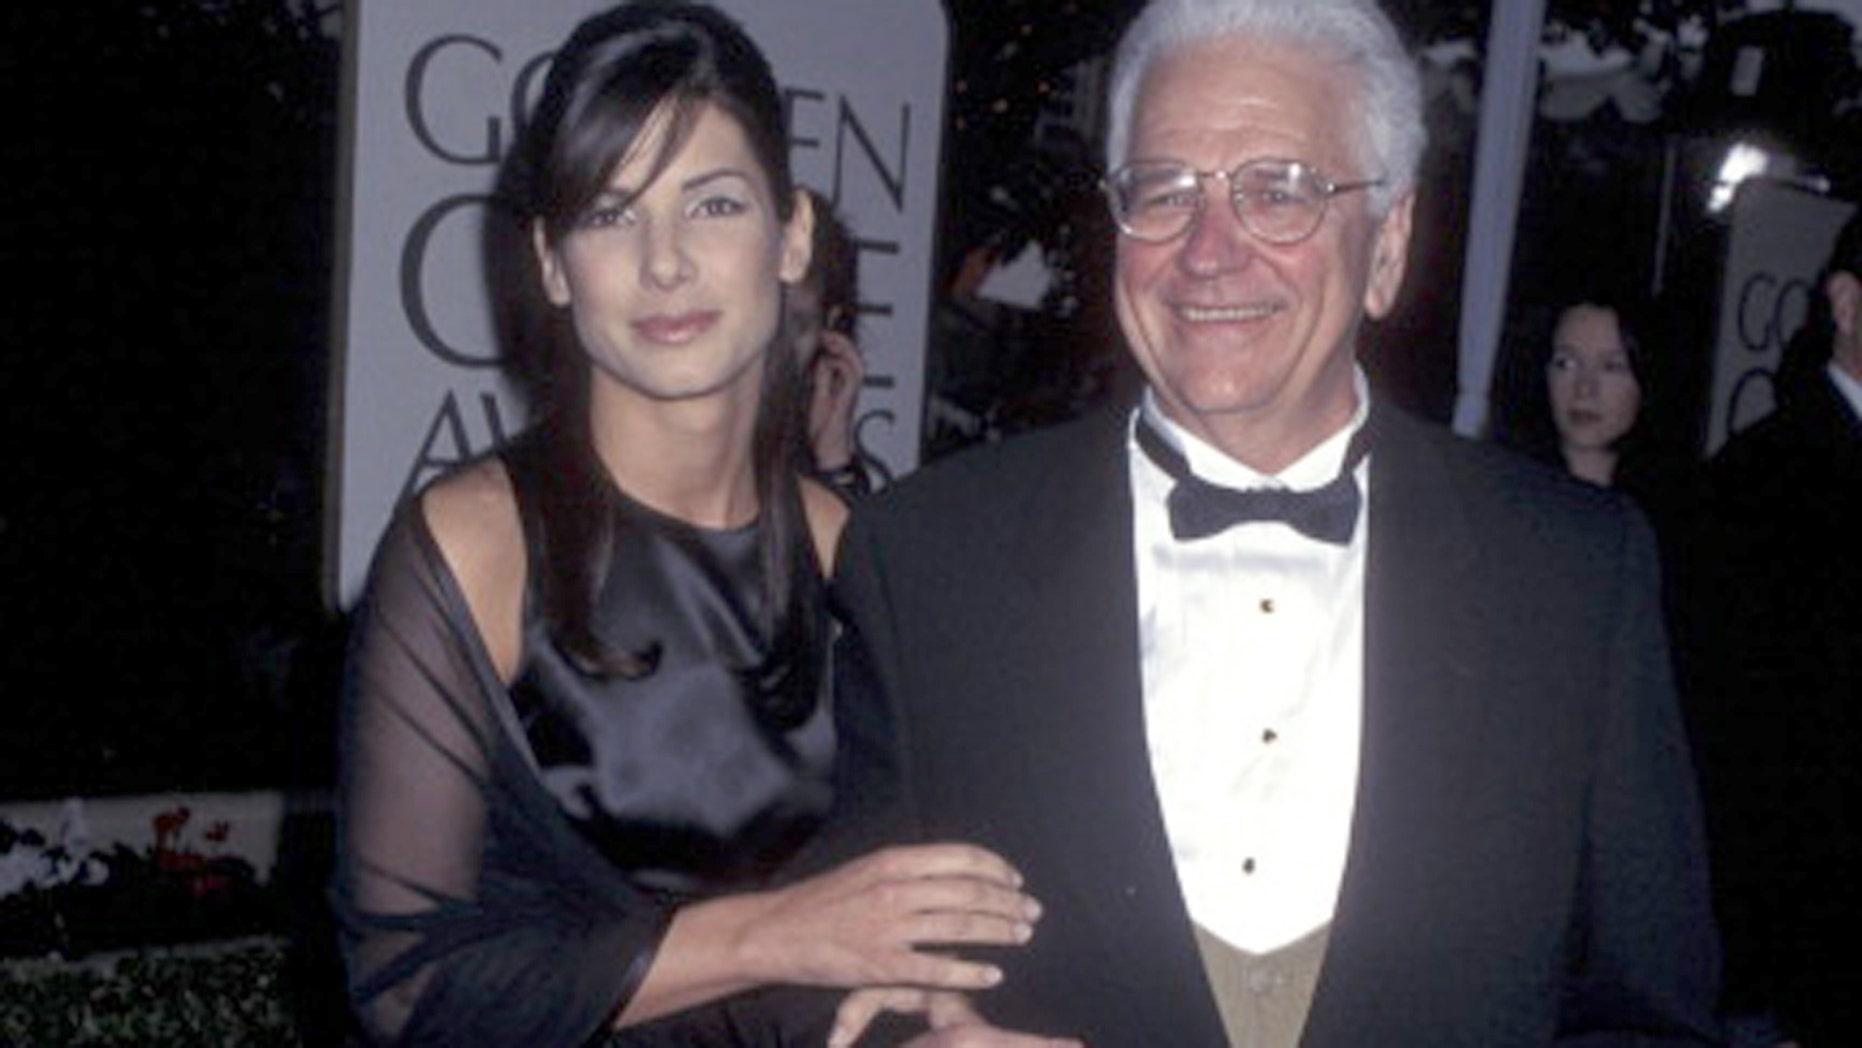 Sandra Bullock is mourning the loss of her father, John Bullock. Here, Sandra and her father attend the 53rd Golden Globe Awards on Jan. 21, 1996 in Beverly Hills, Calif.